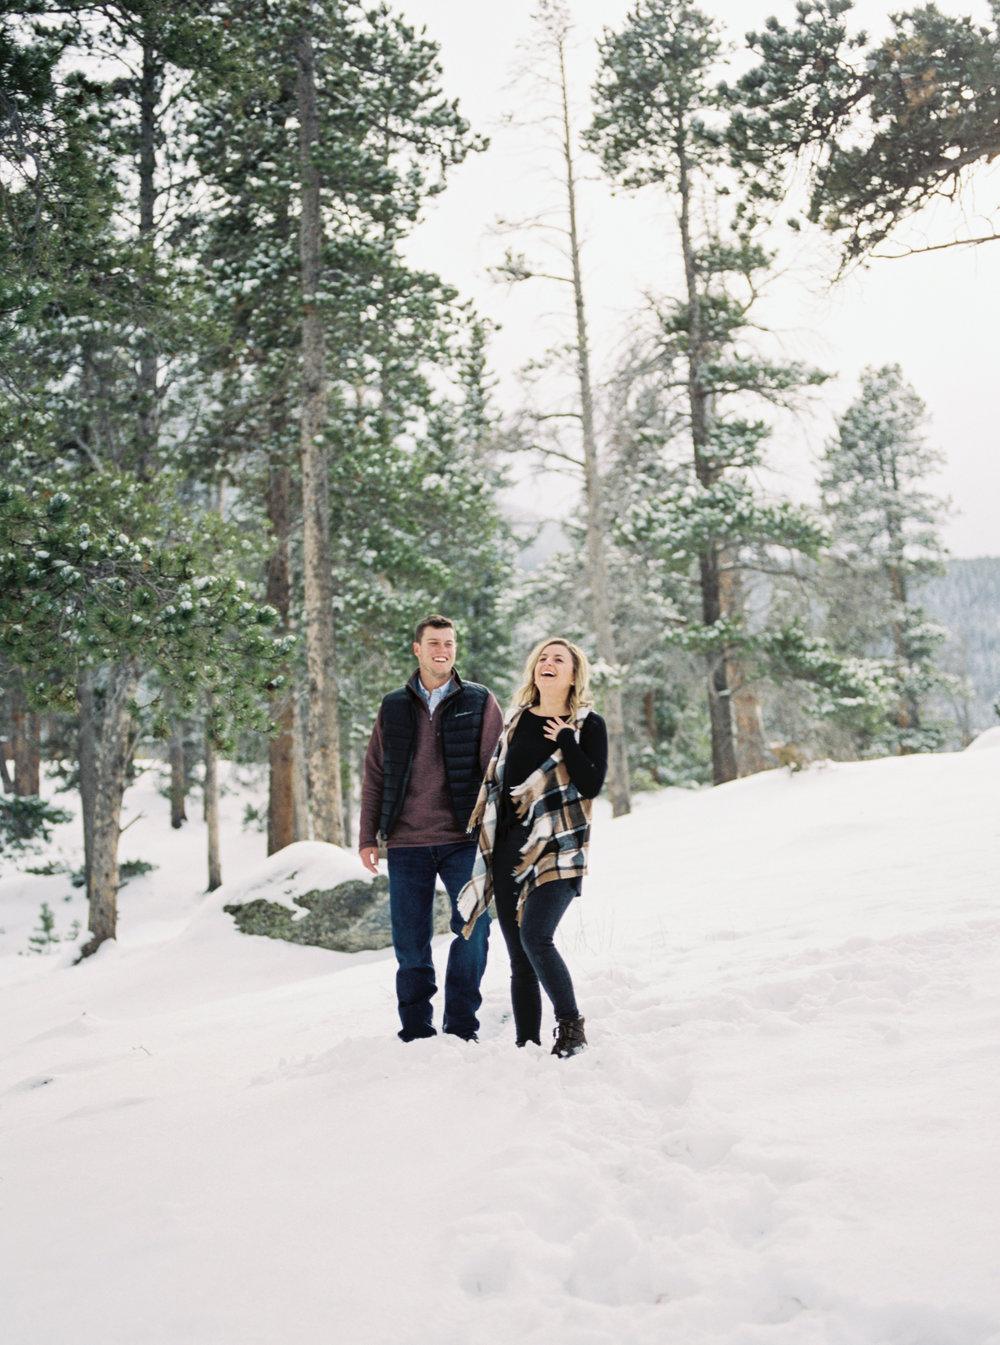 Colorado Winter Engagement Session - Fine Art Film Photographer Tara Bielecki Photography